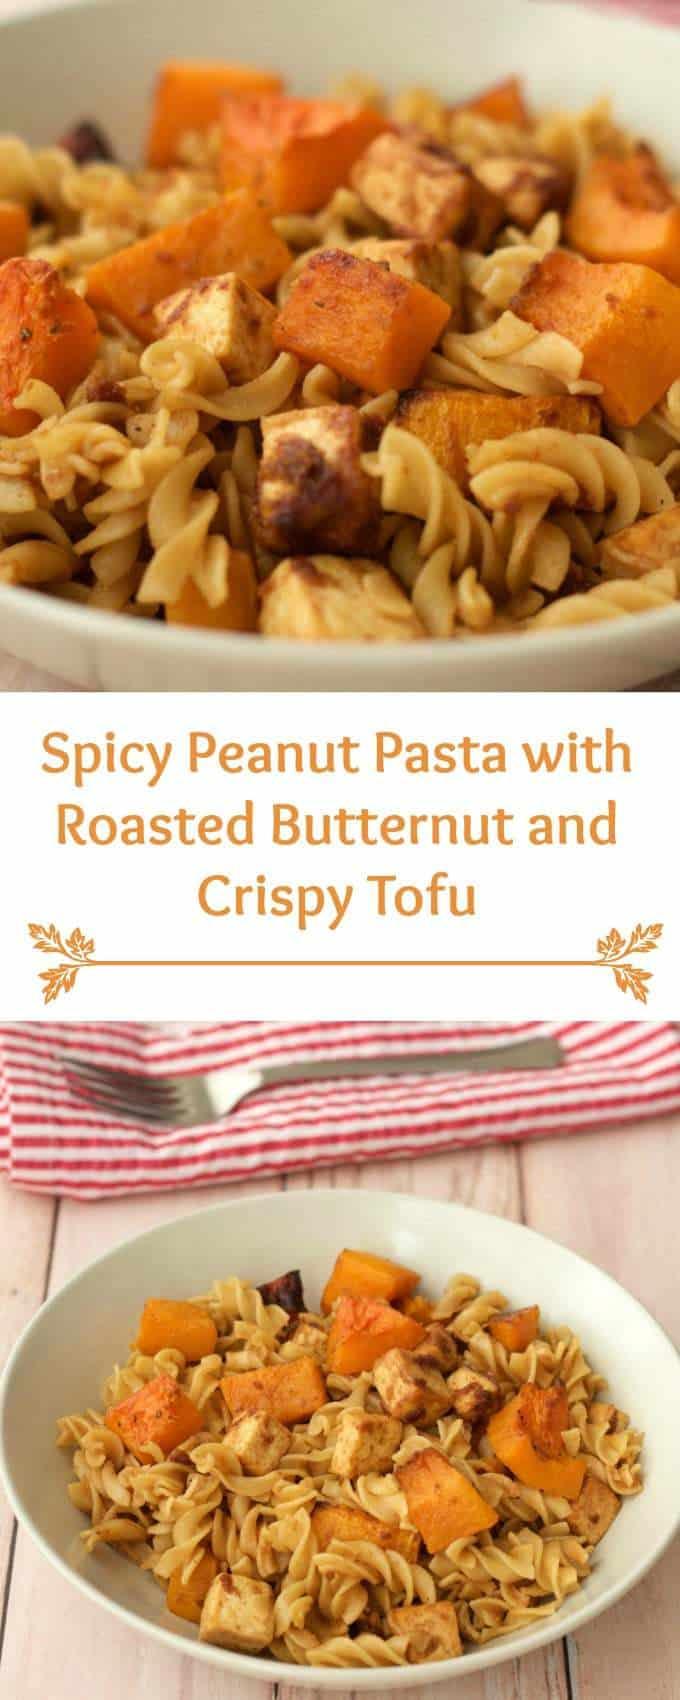 Spicy Peanut Pasta with Roasted Butternut and Crispy Tofu #vegan #lovingitvegan #entree #pasta #dinner